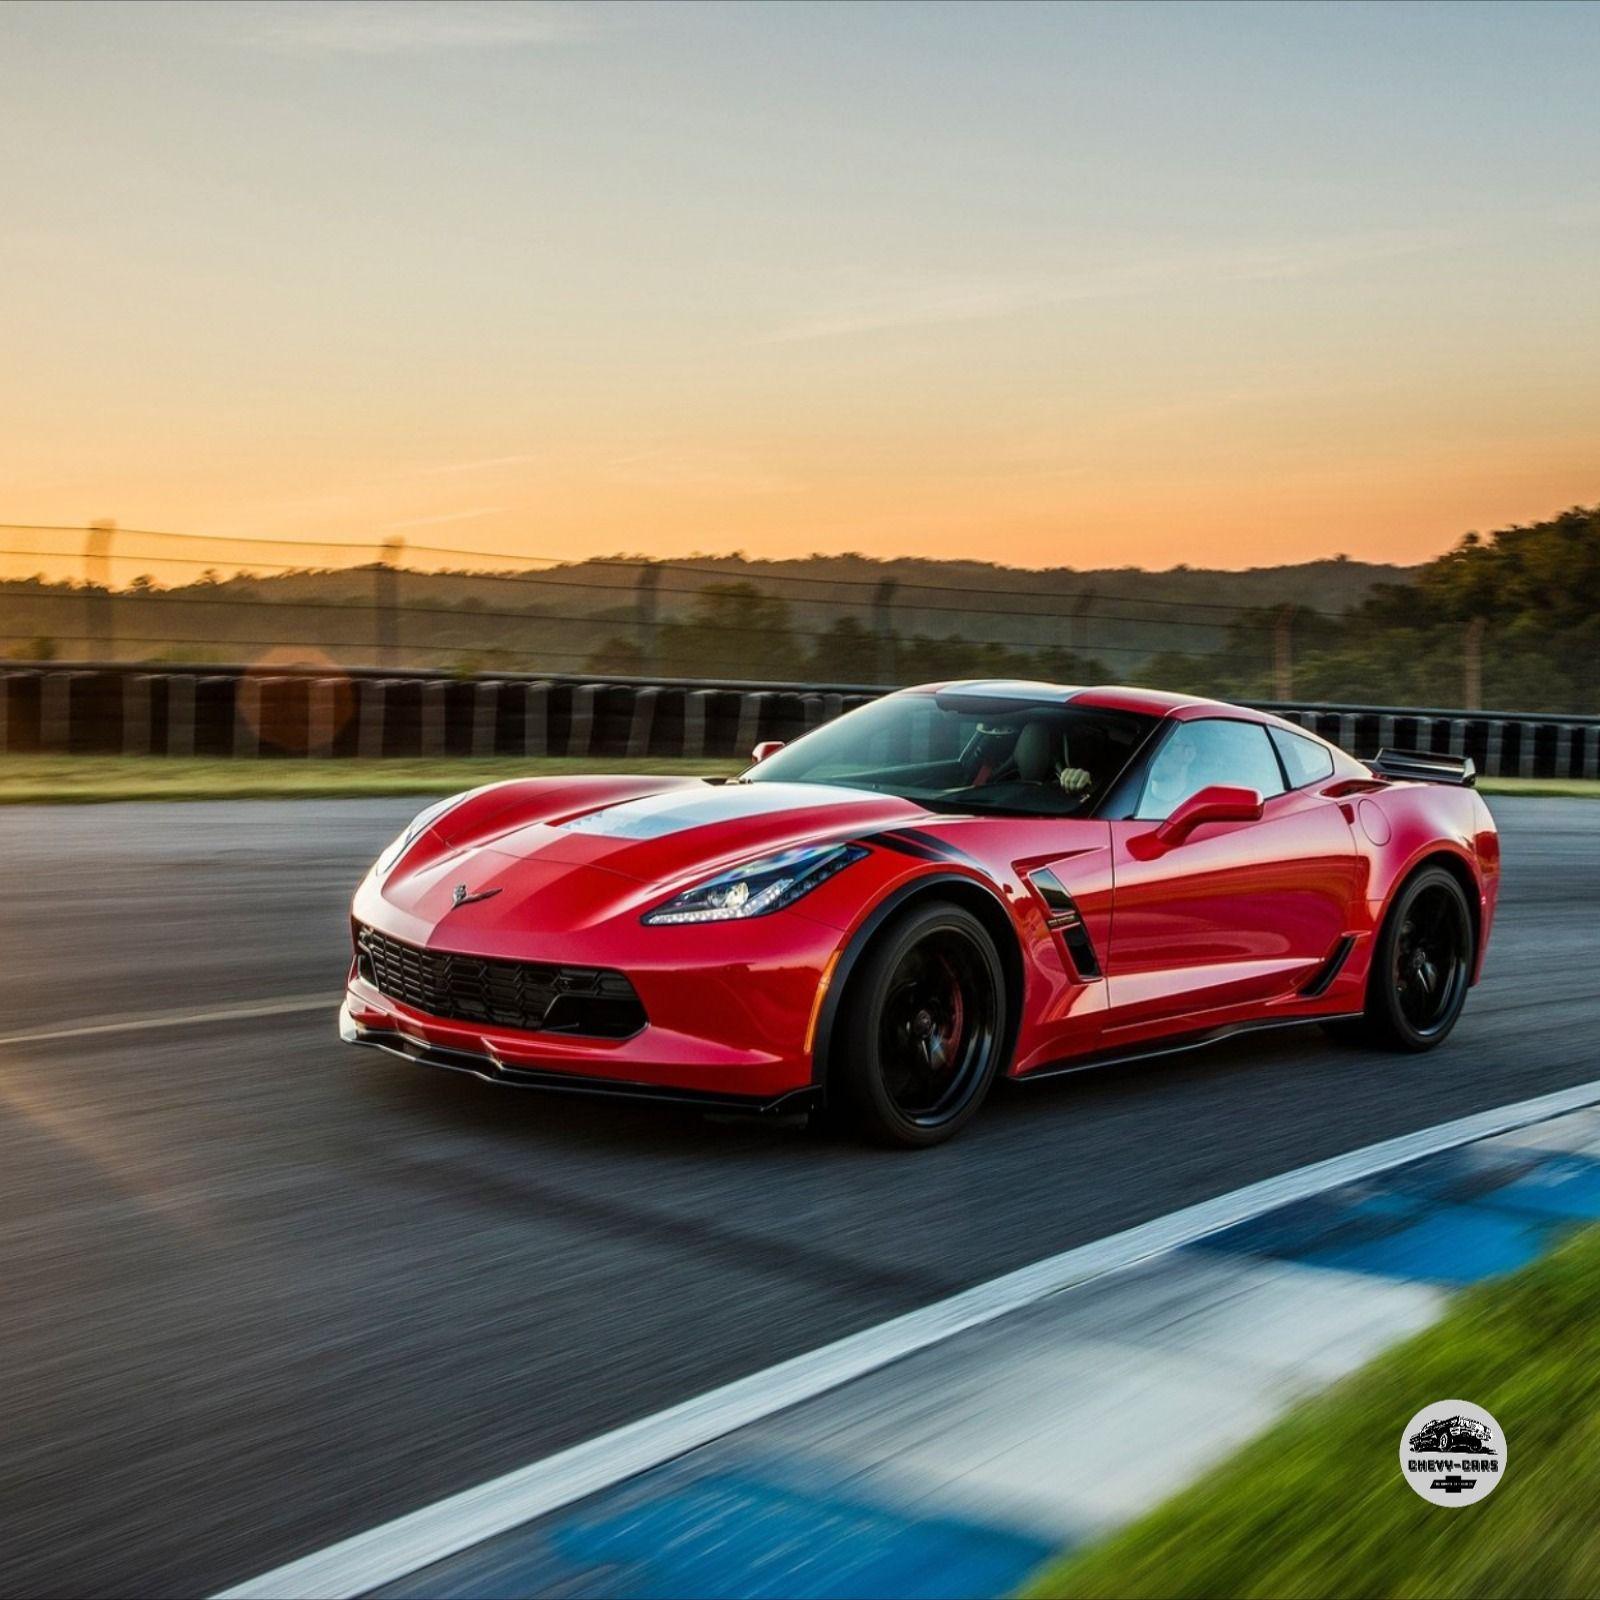 Reviews News Forums Used Cars For Sale In 2020 Corvette Grand Sport Chevy Corvette Corvette